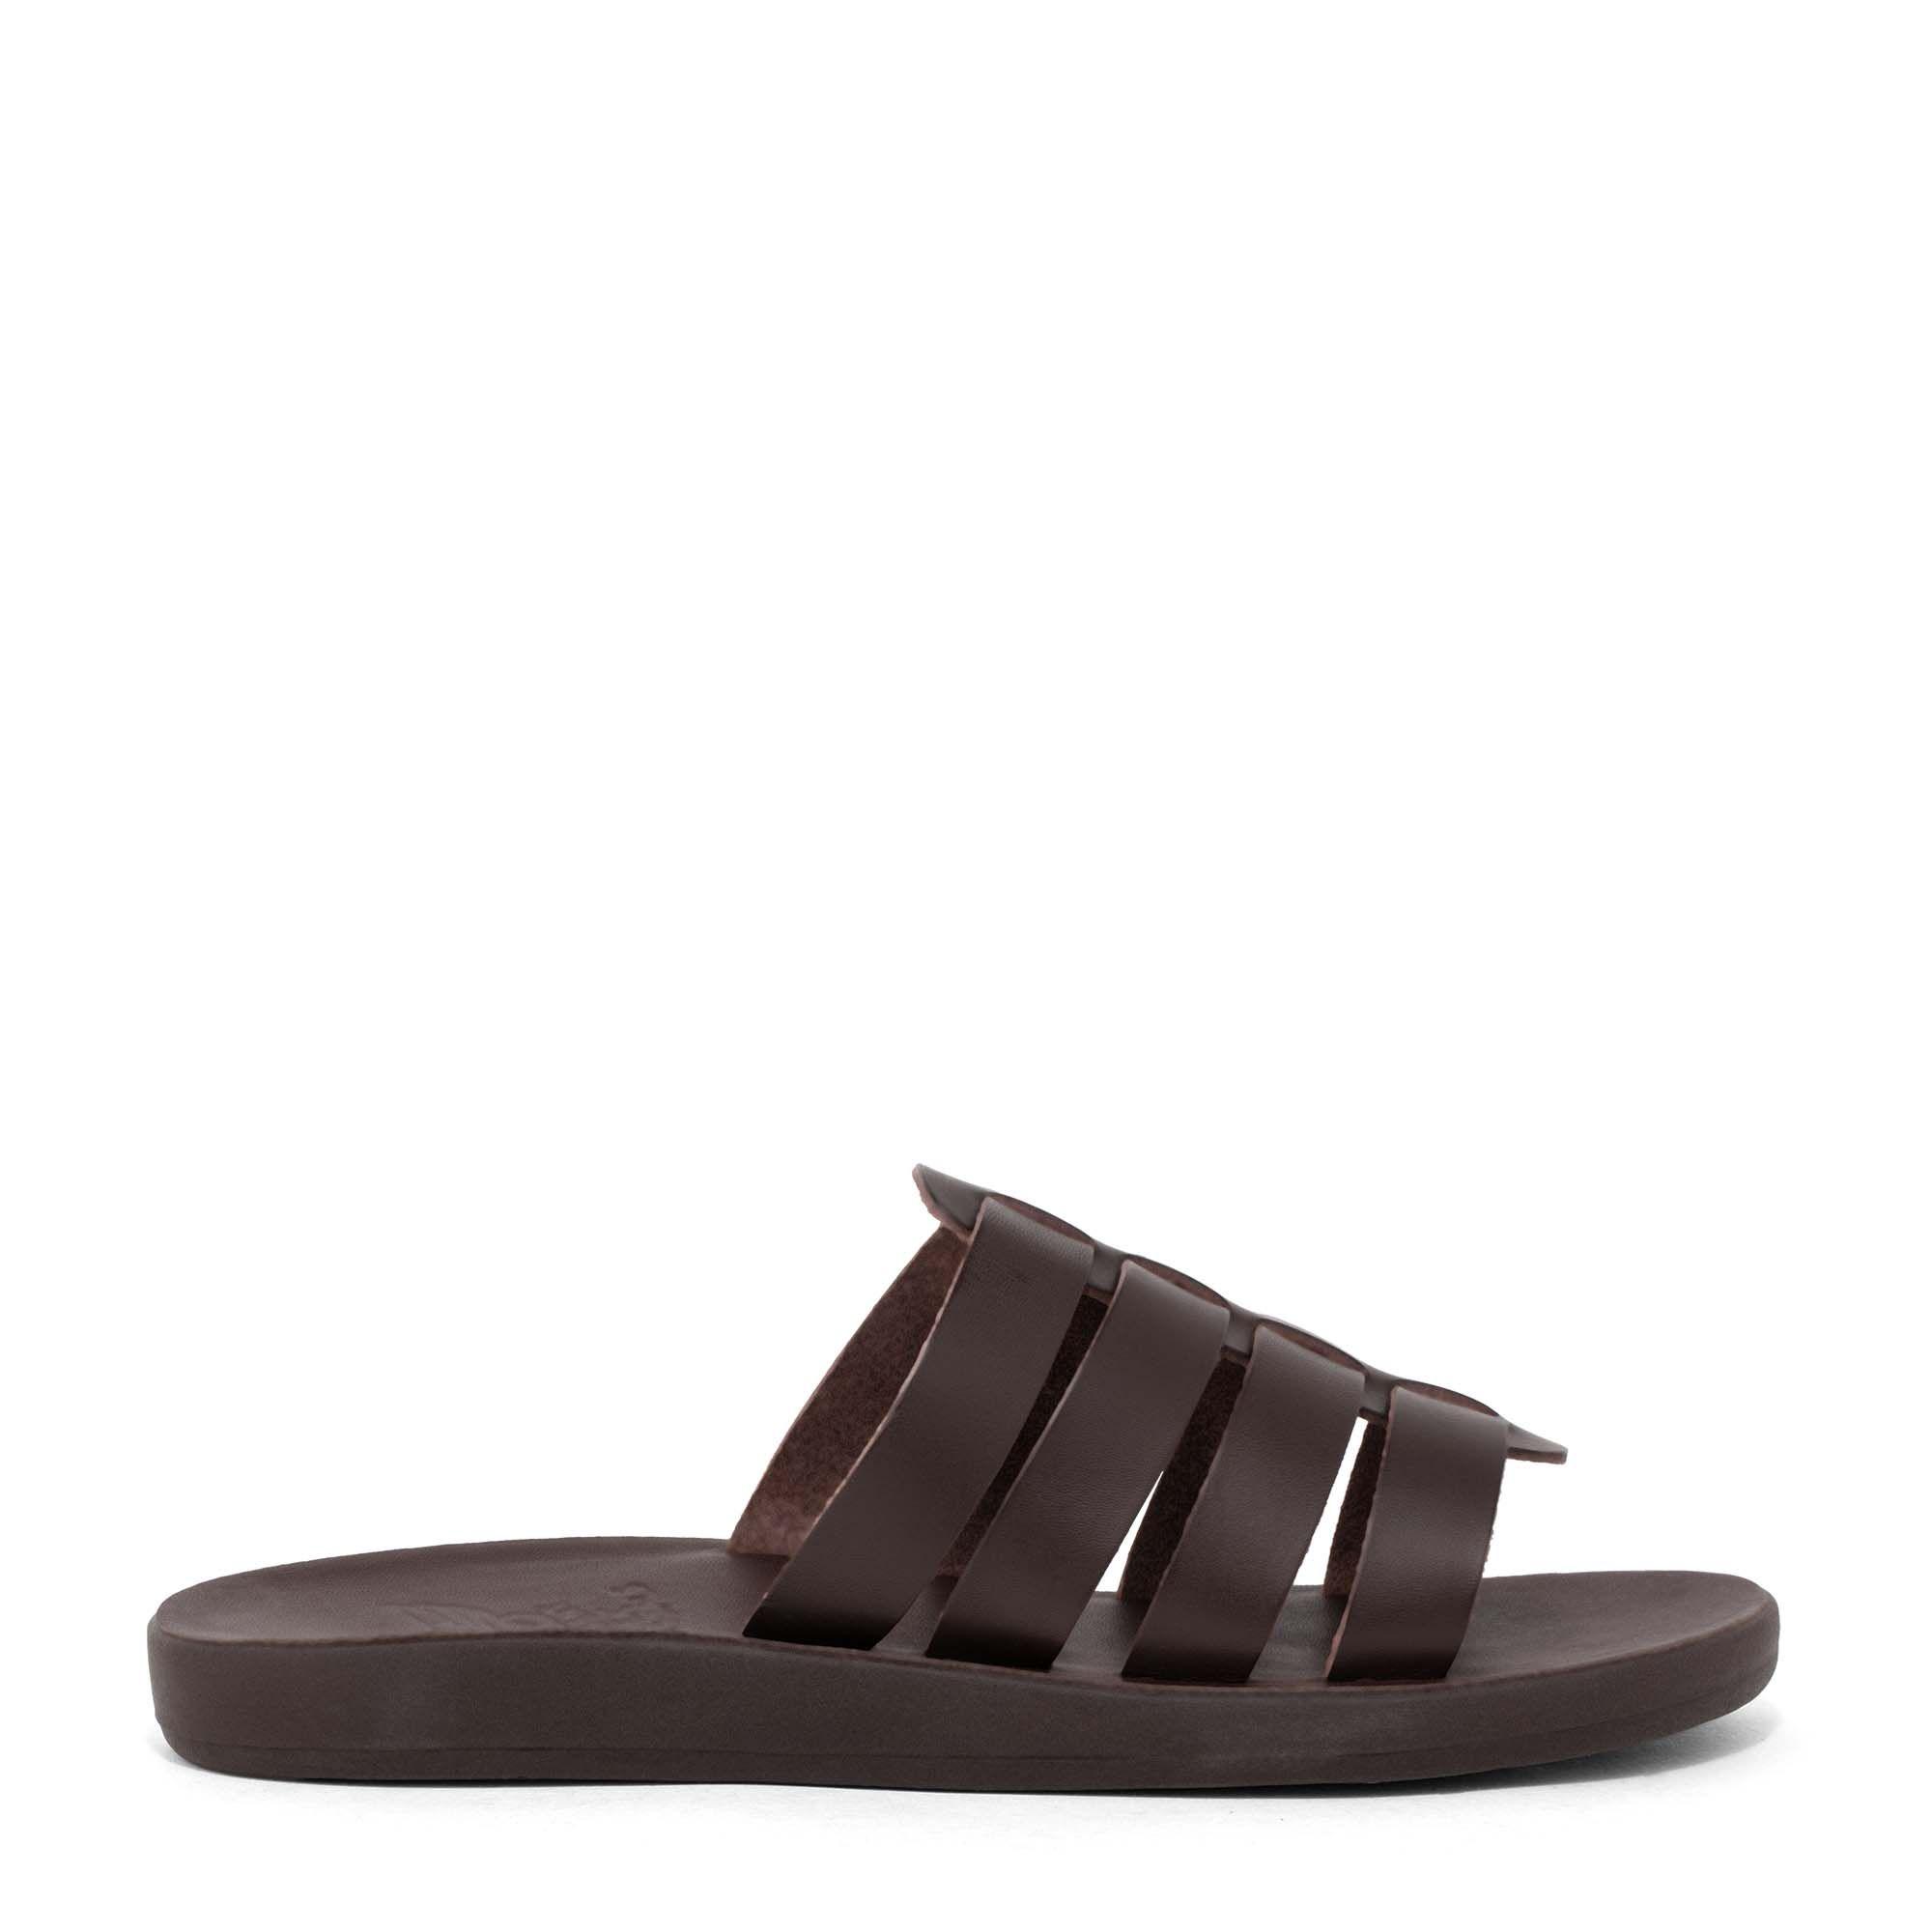 Apollonas Comfort sandals